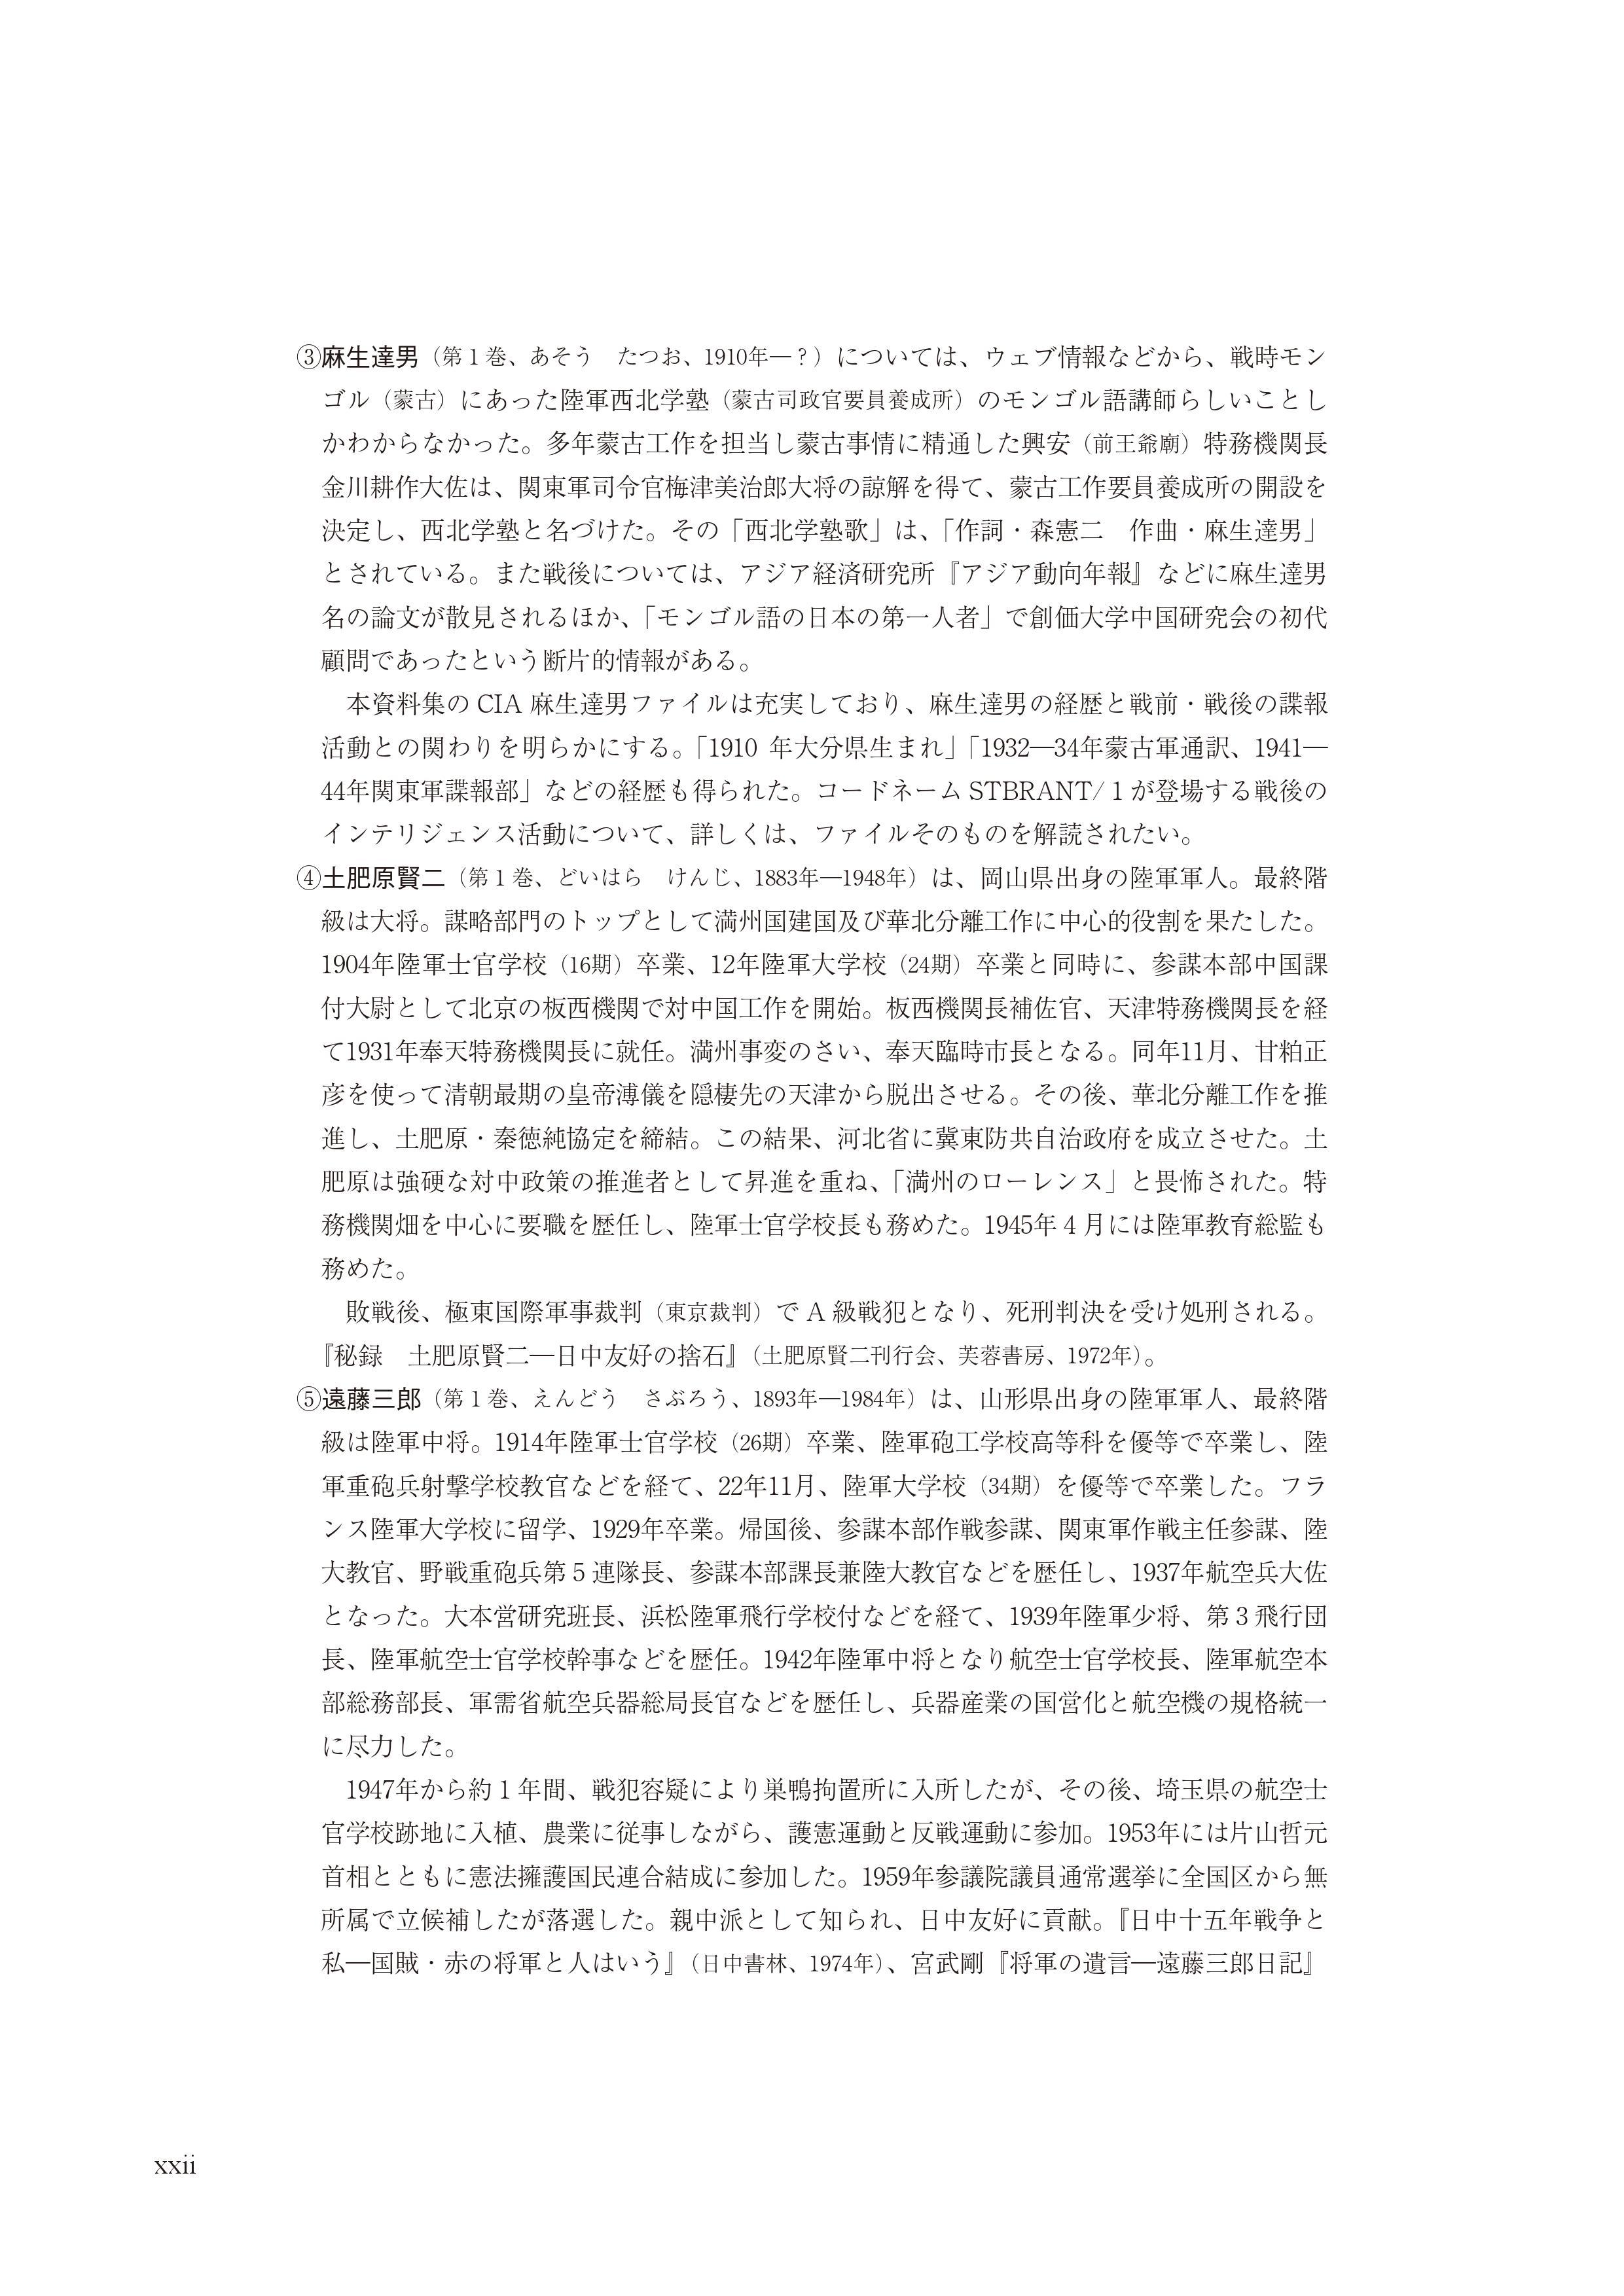 CIA日本人ファイル0001 (22)